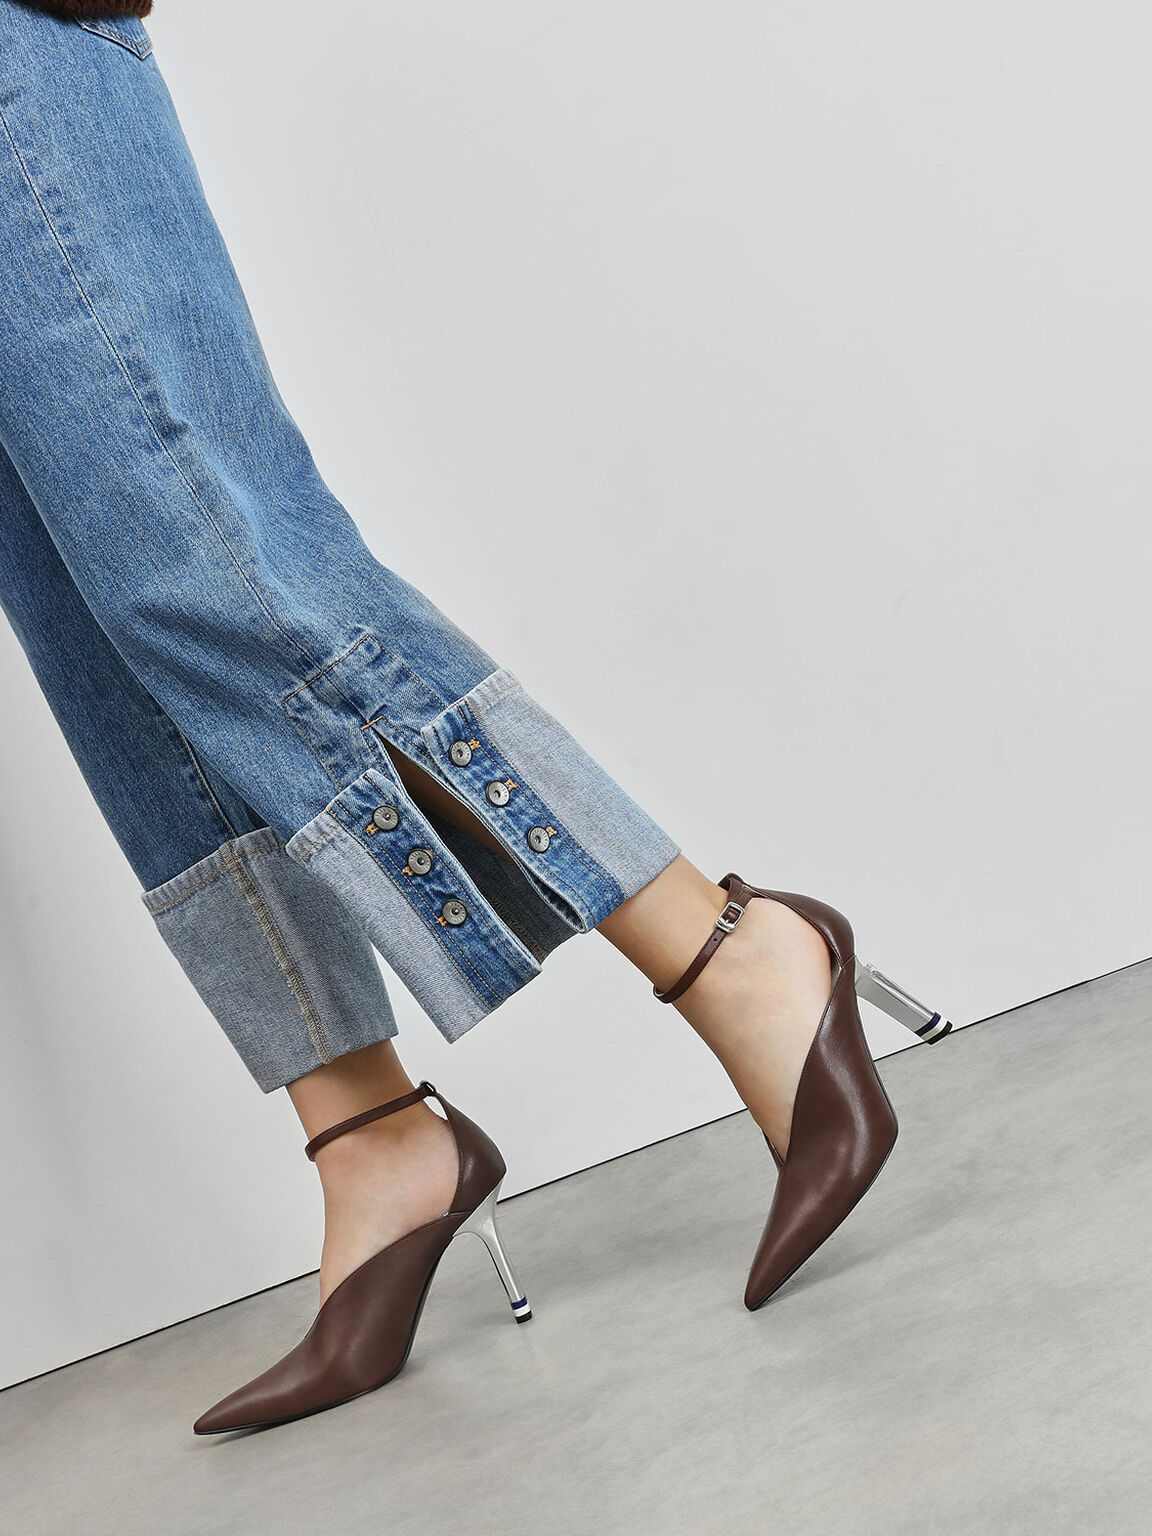 V-Cut Pointed Toe Pumps, Dark Brown, hi-res